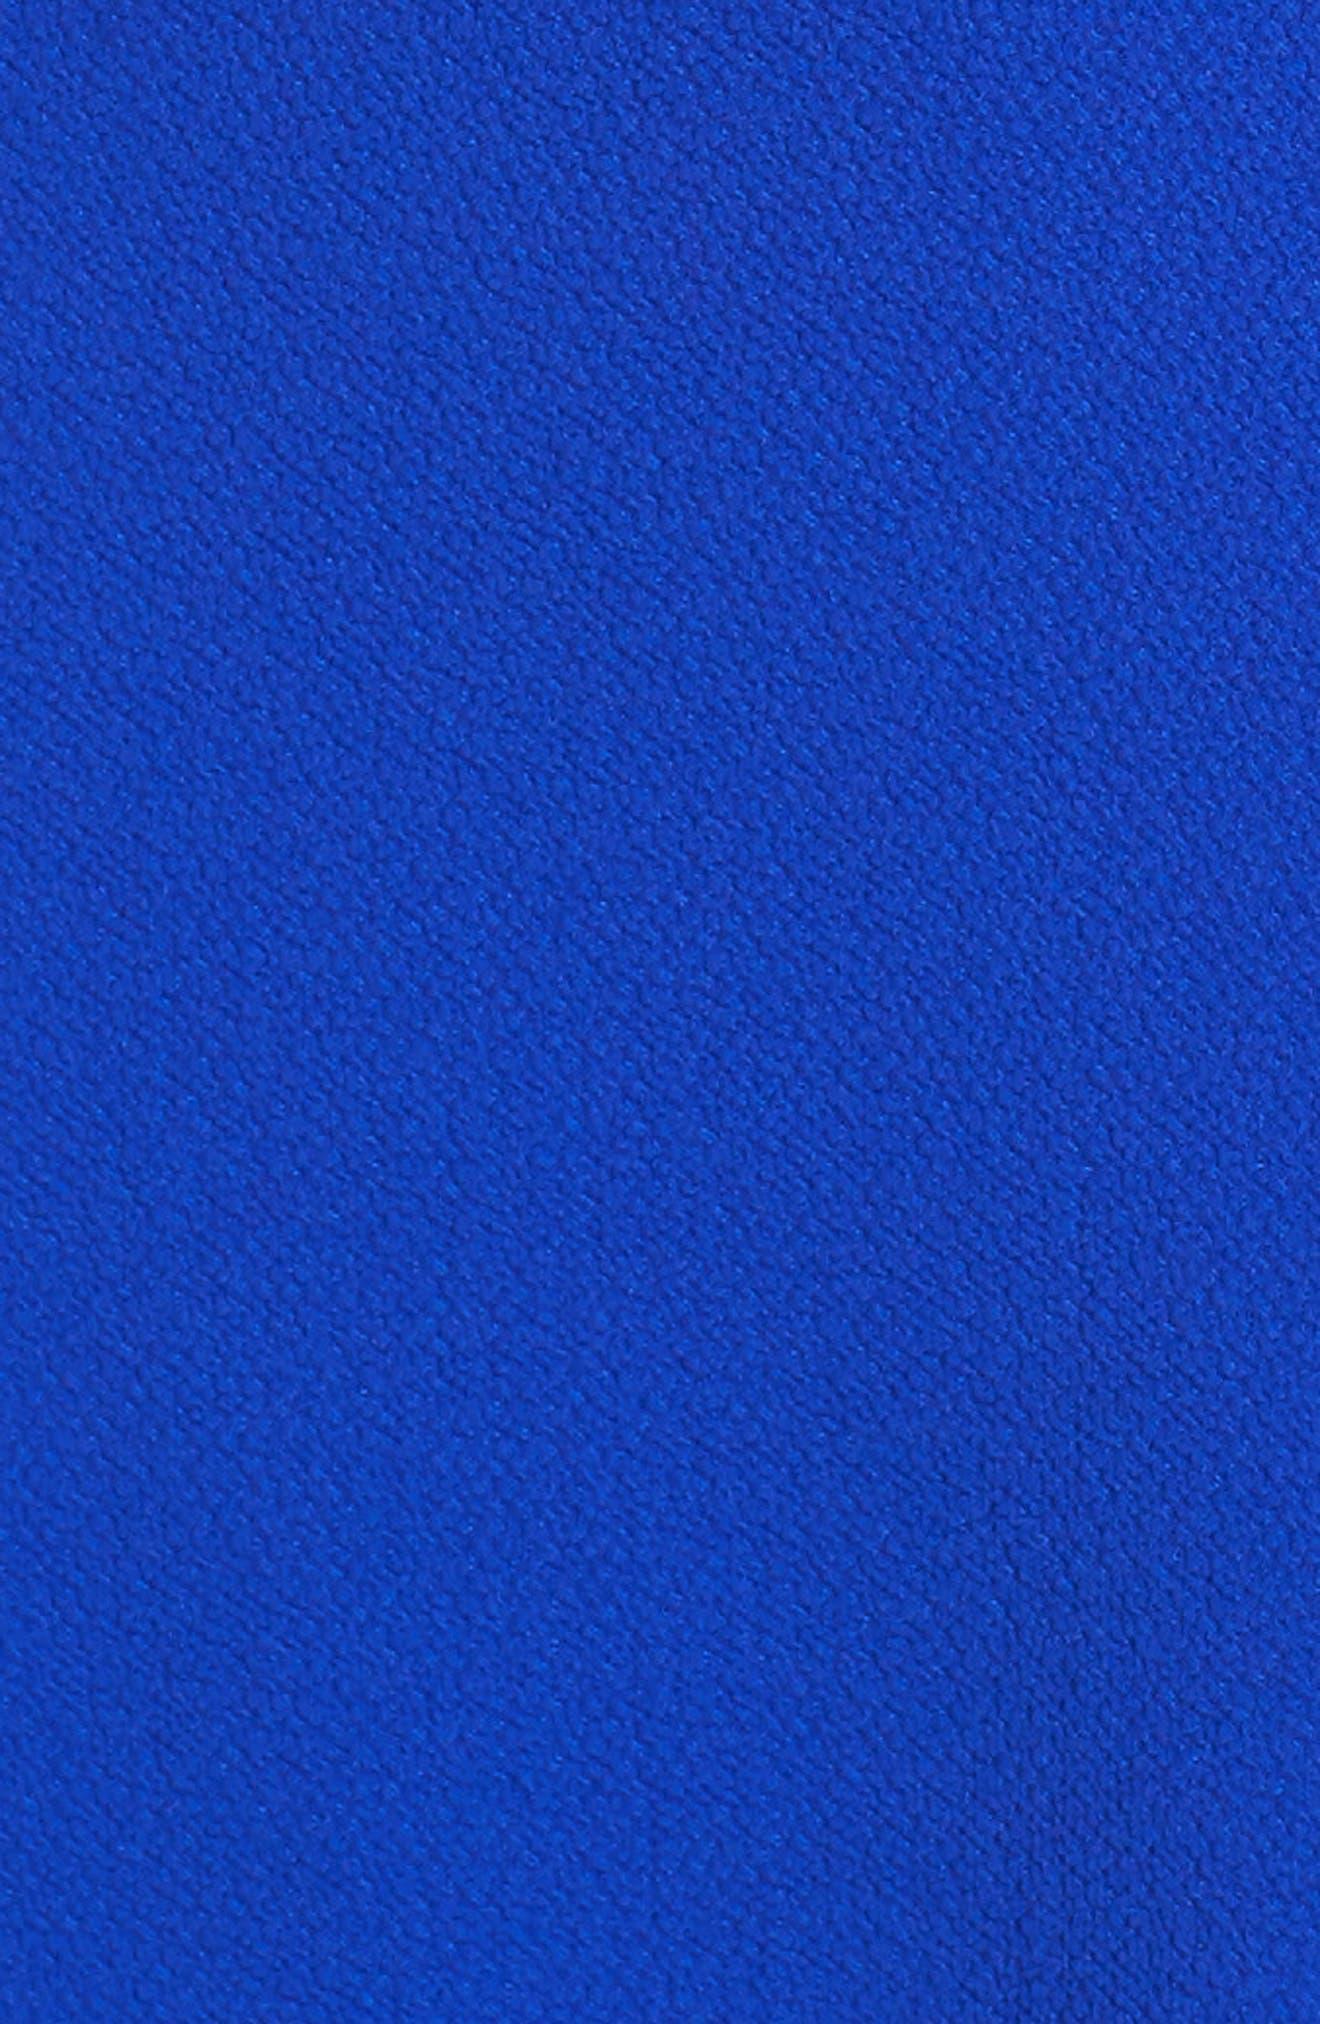 Rocco Maxi Romper,                             Alternate thumbnail 6, color,                             Royal Blue Pebble